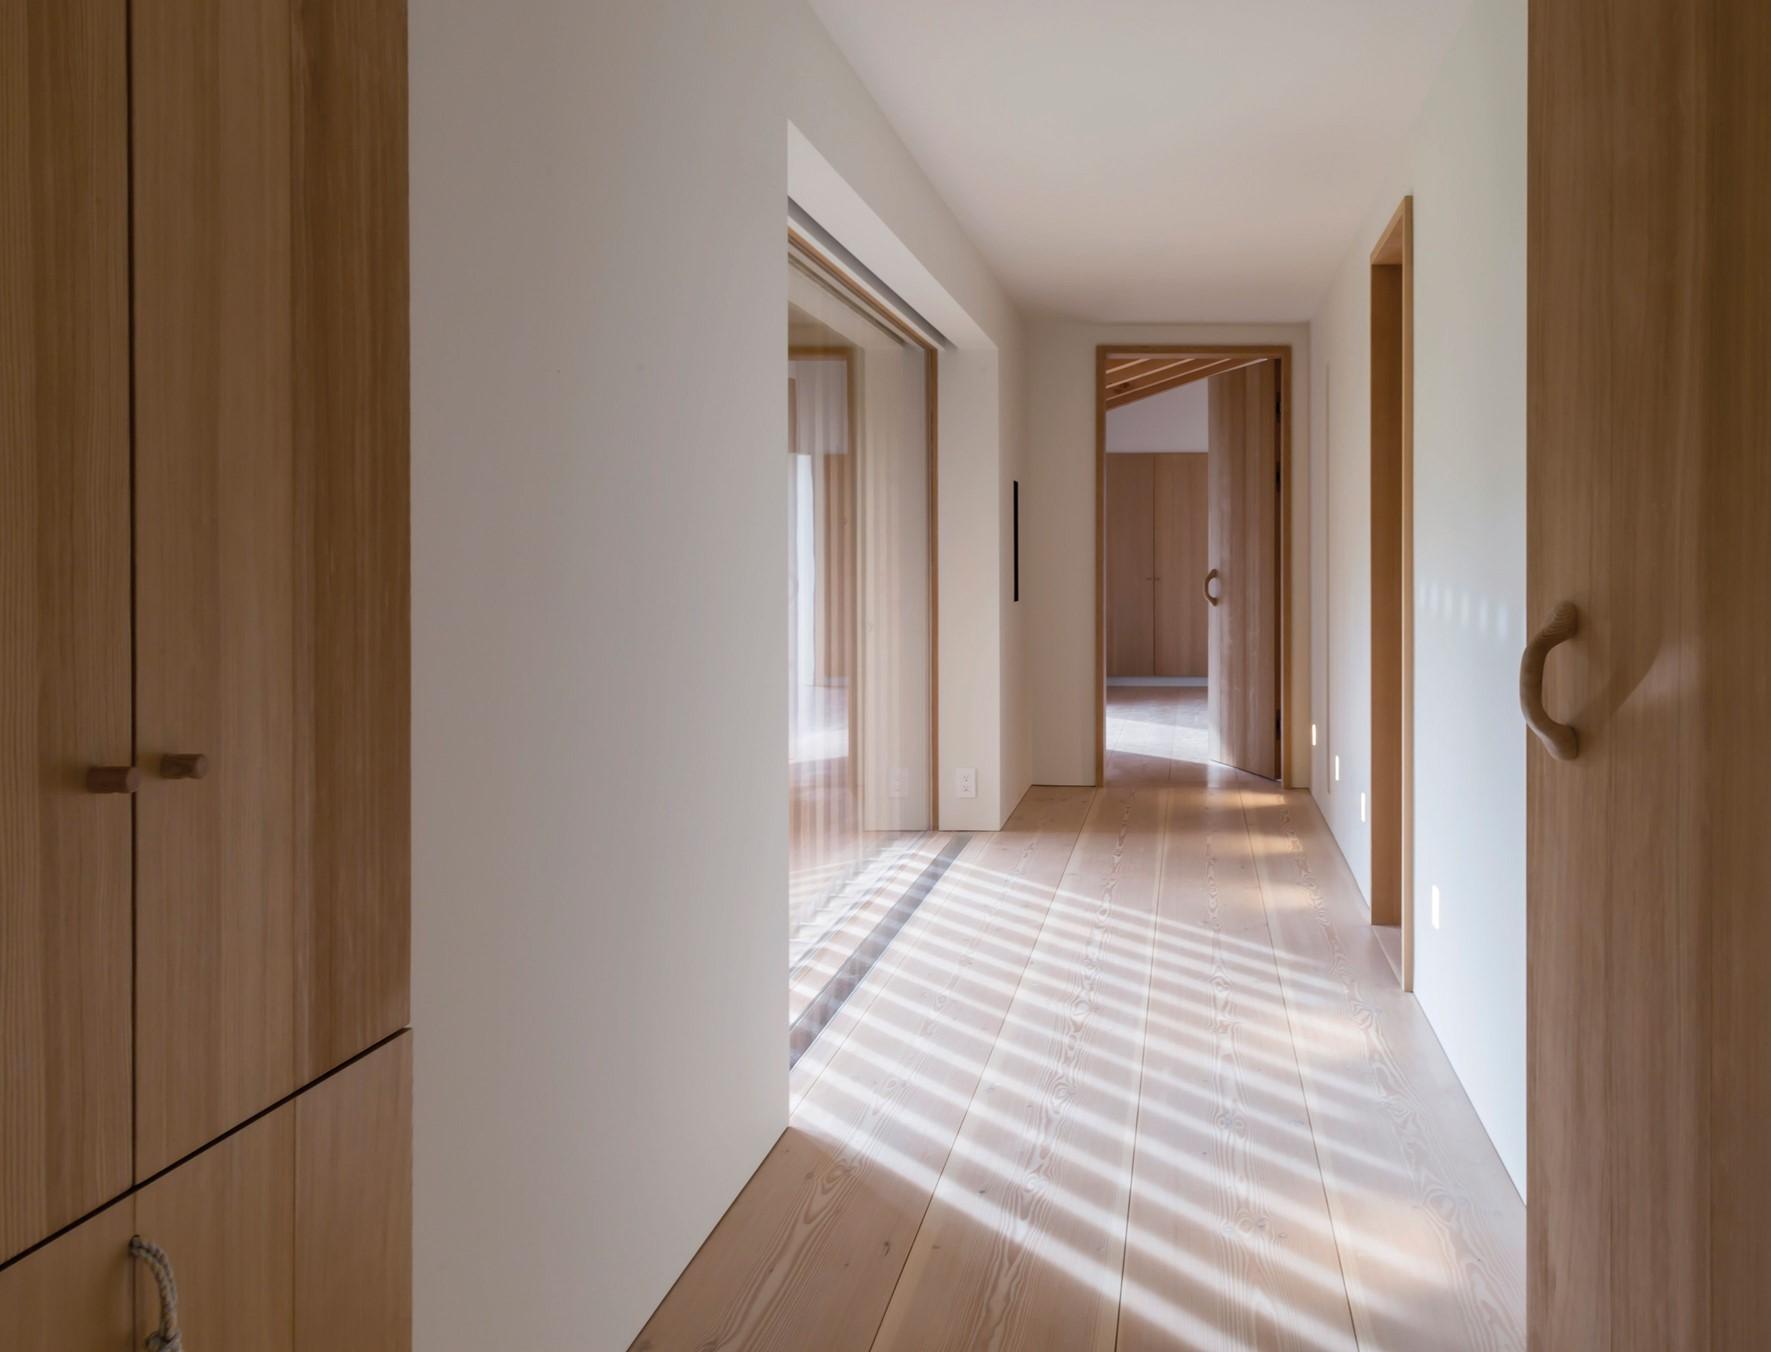 solid-douglas-floor_lye-natural-oil_jackson-hole_hallway_dinesen.jpg